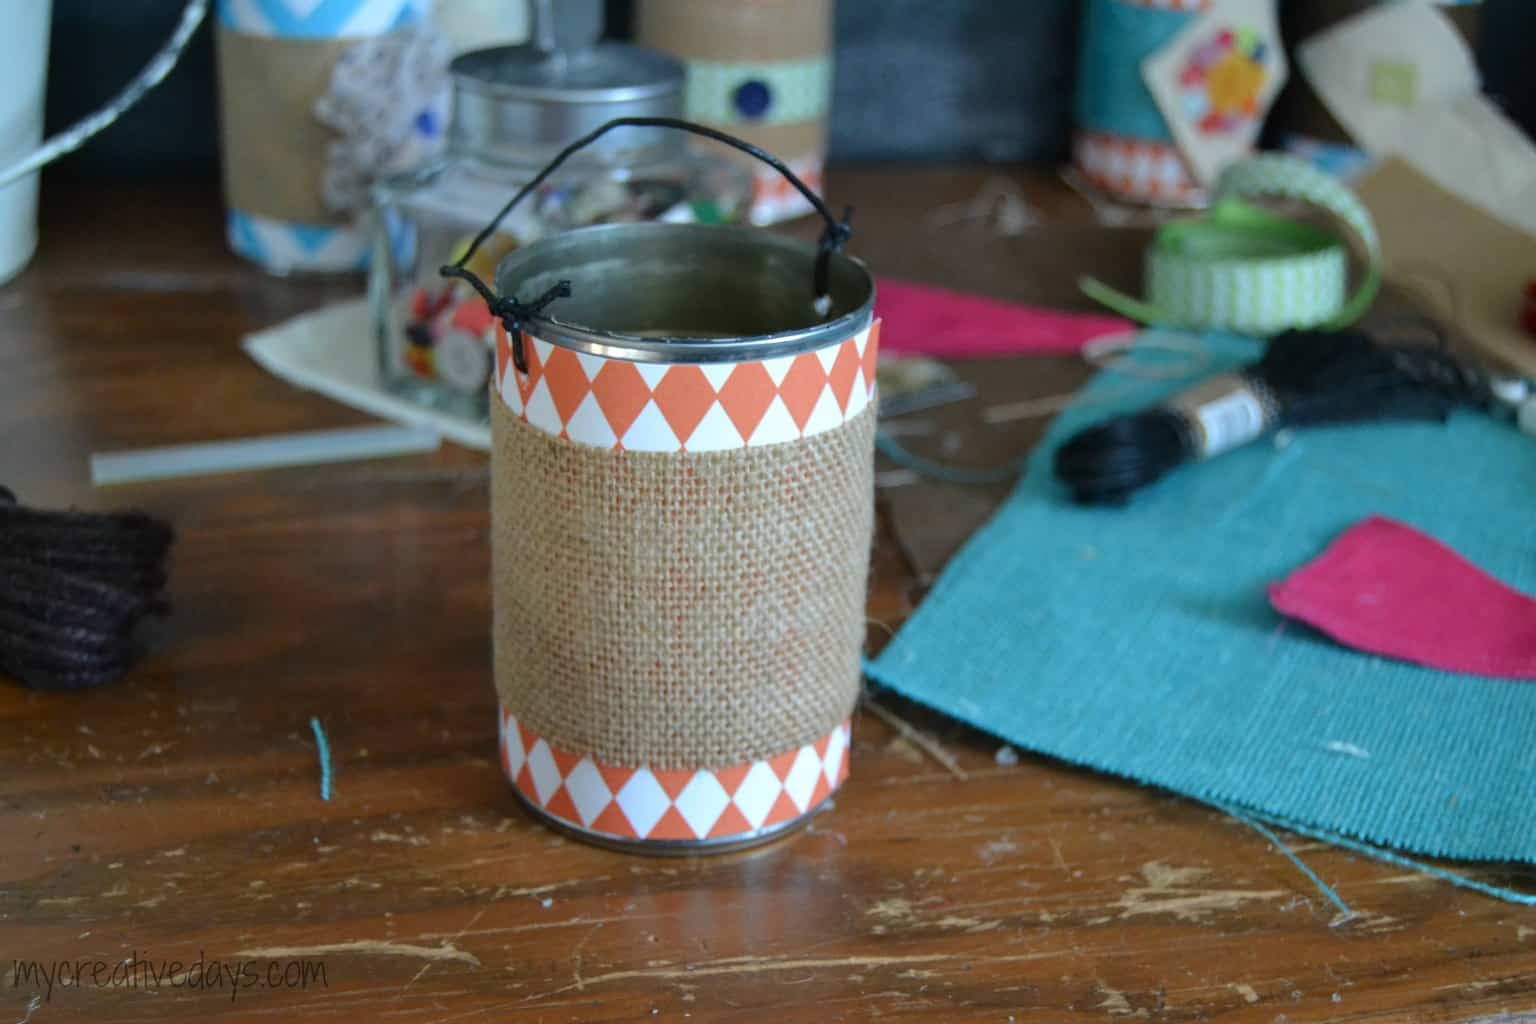 DIY May Day Baskets mycreativedays.com